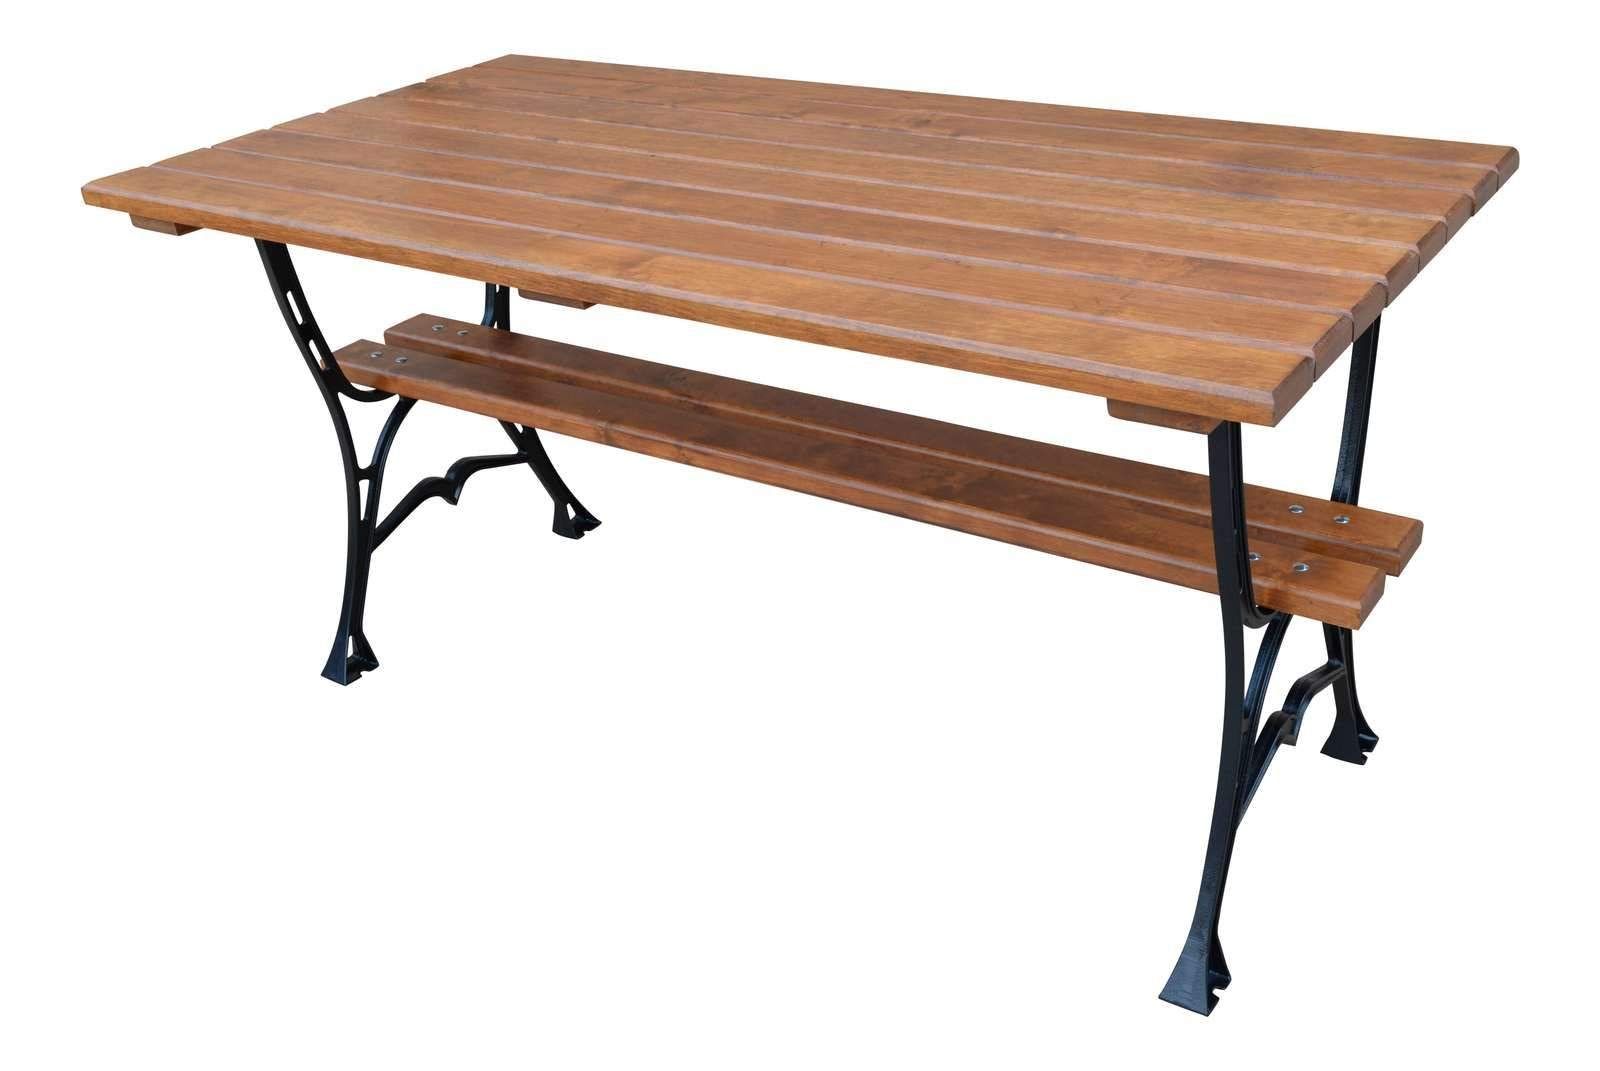 Krakwood - Mesa de jardín (rectangular, madera): Amazon.es: Jardín